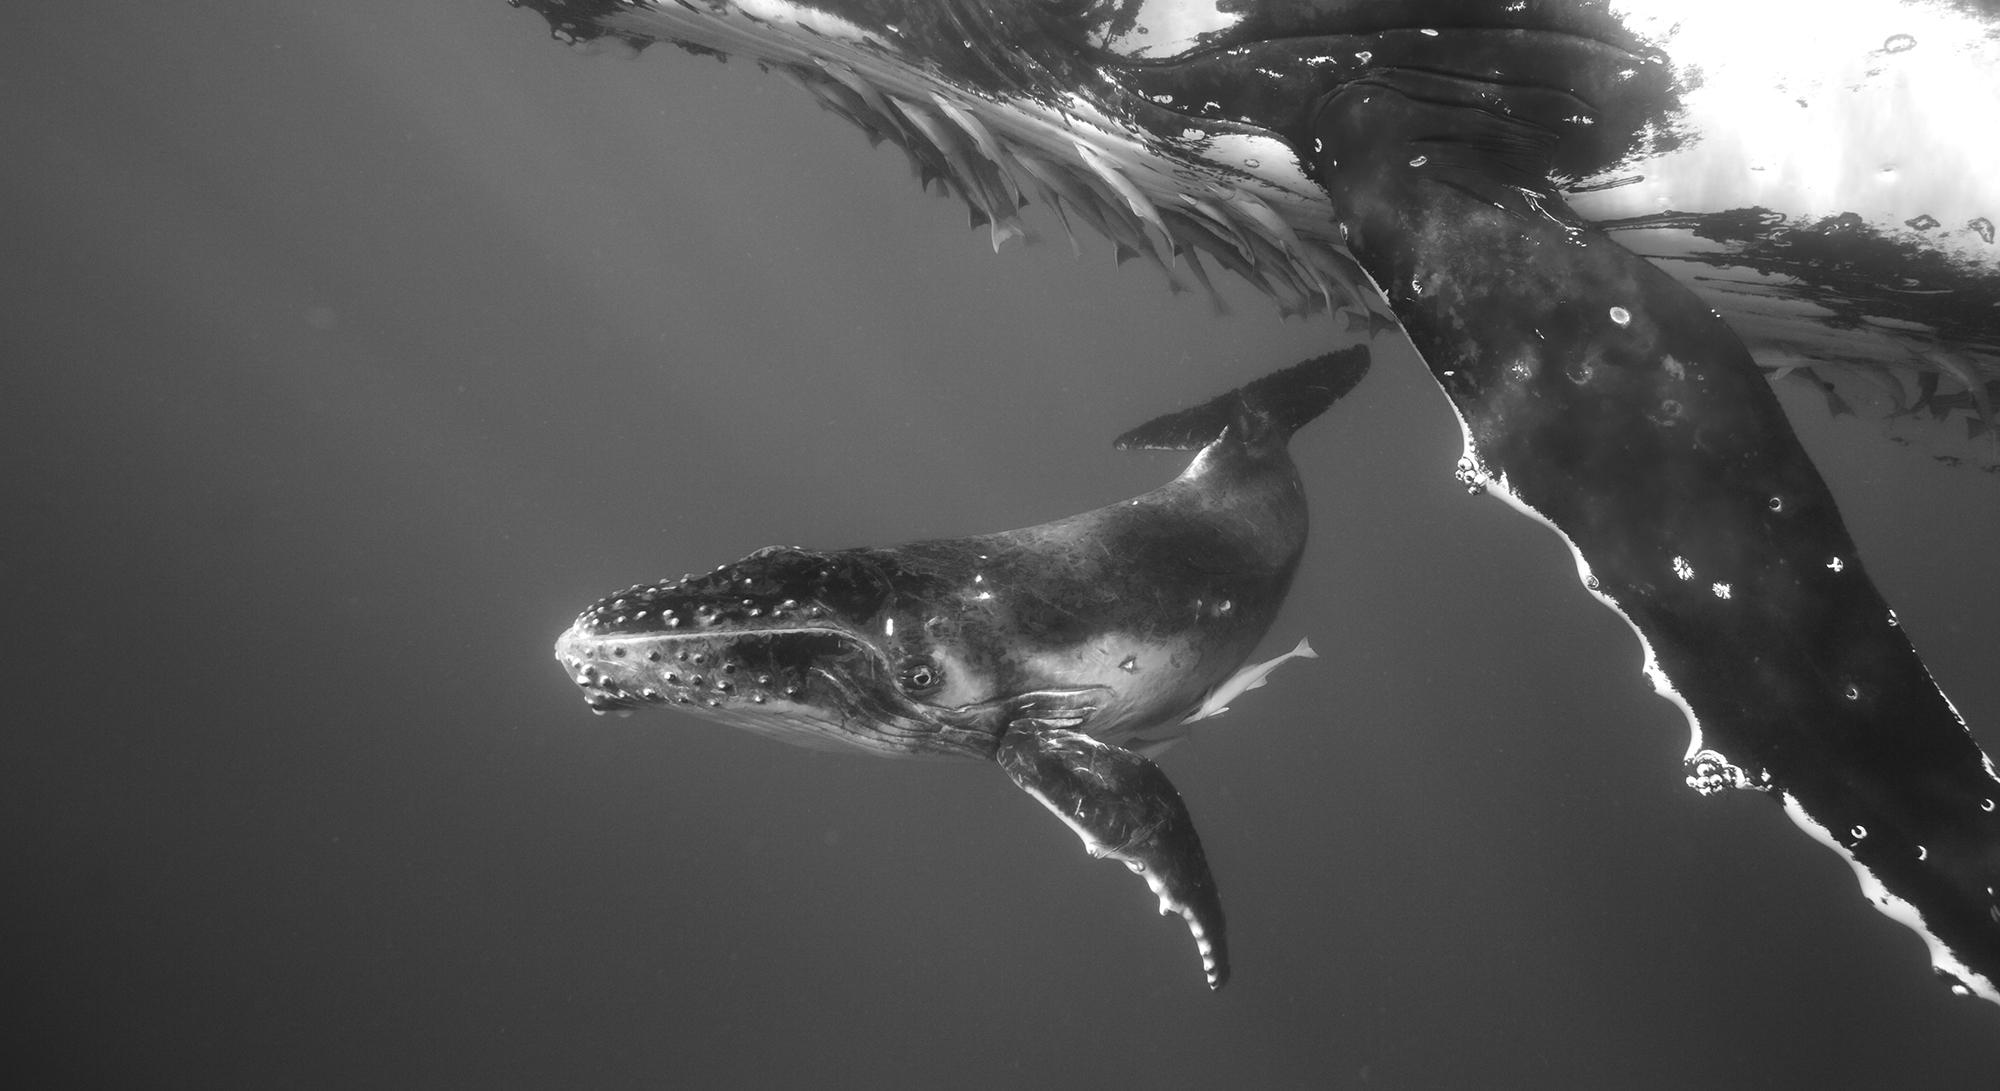 Humpback Whale Mother and Calf II, 2005